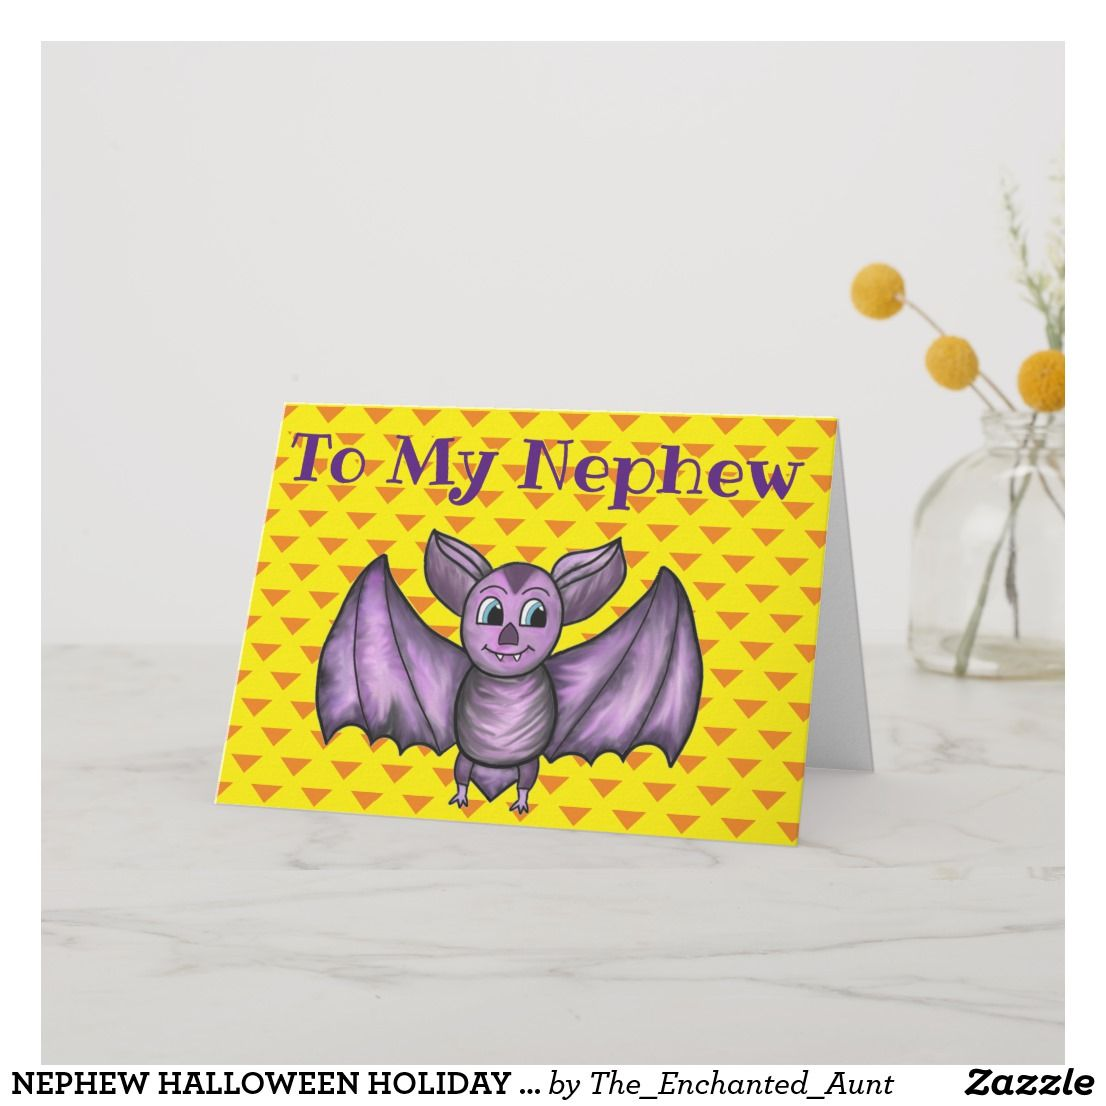 NEPHEW HALLOWEEN HOLIDAY CARD BAT ORANGE PURPLE   Zazzle.com   Presents for aunts, Aunt gifts ...